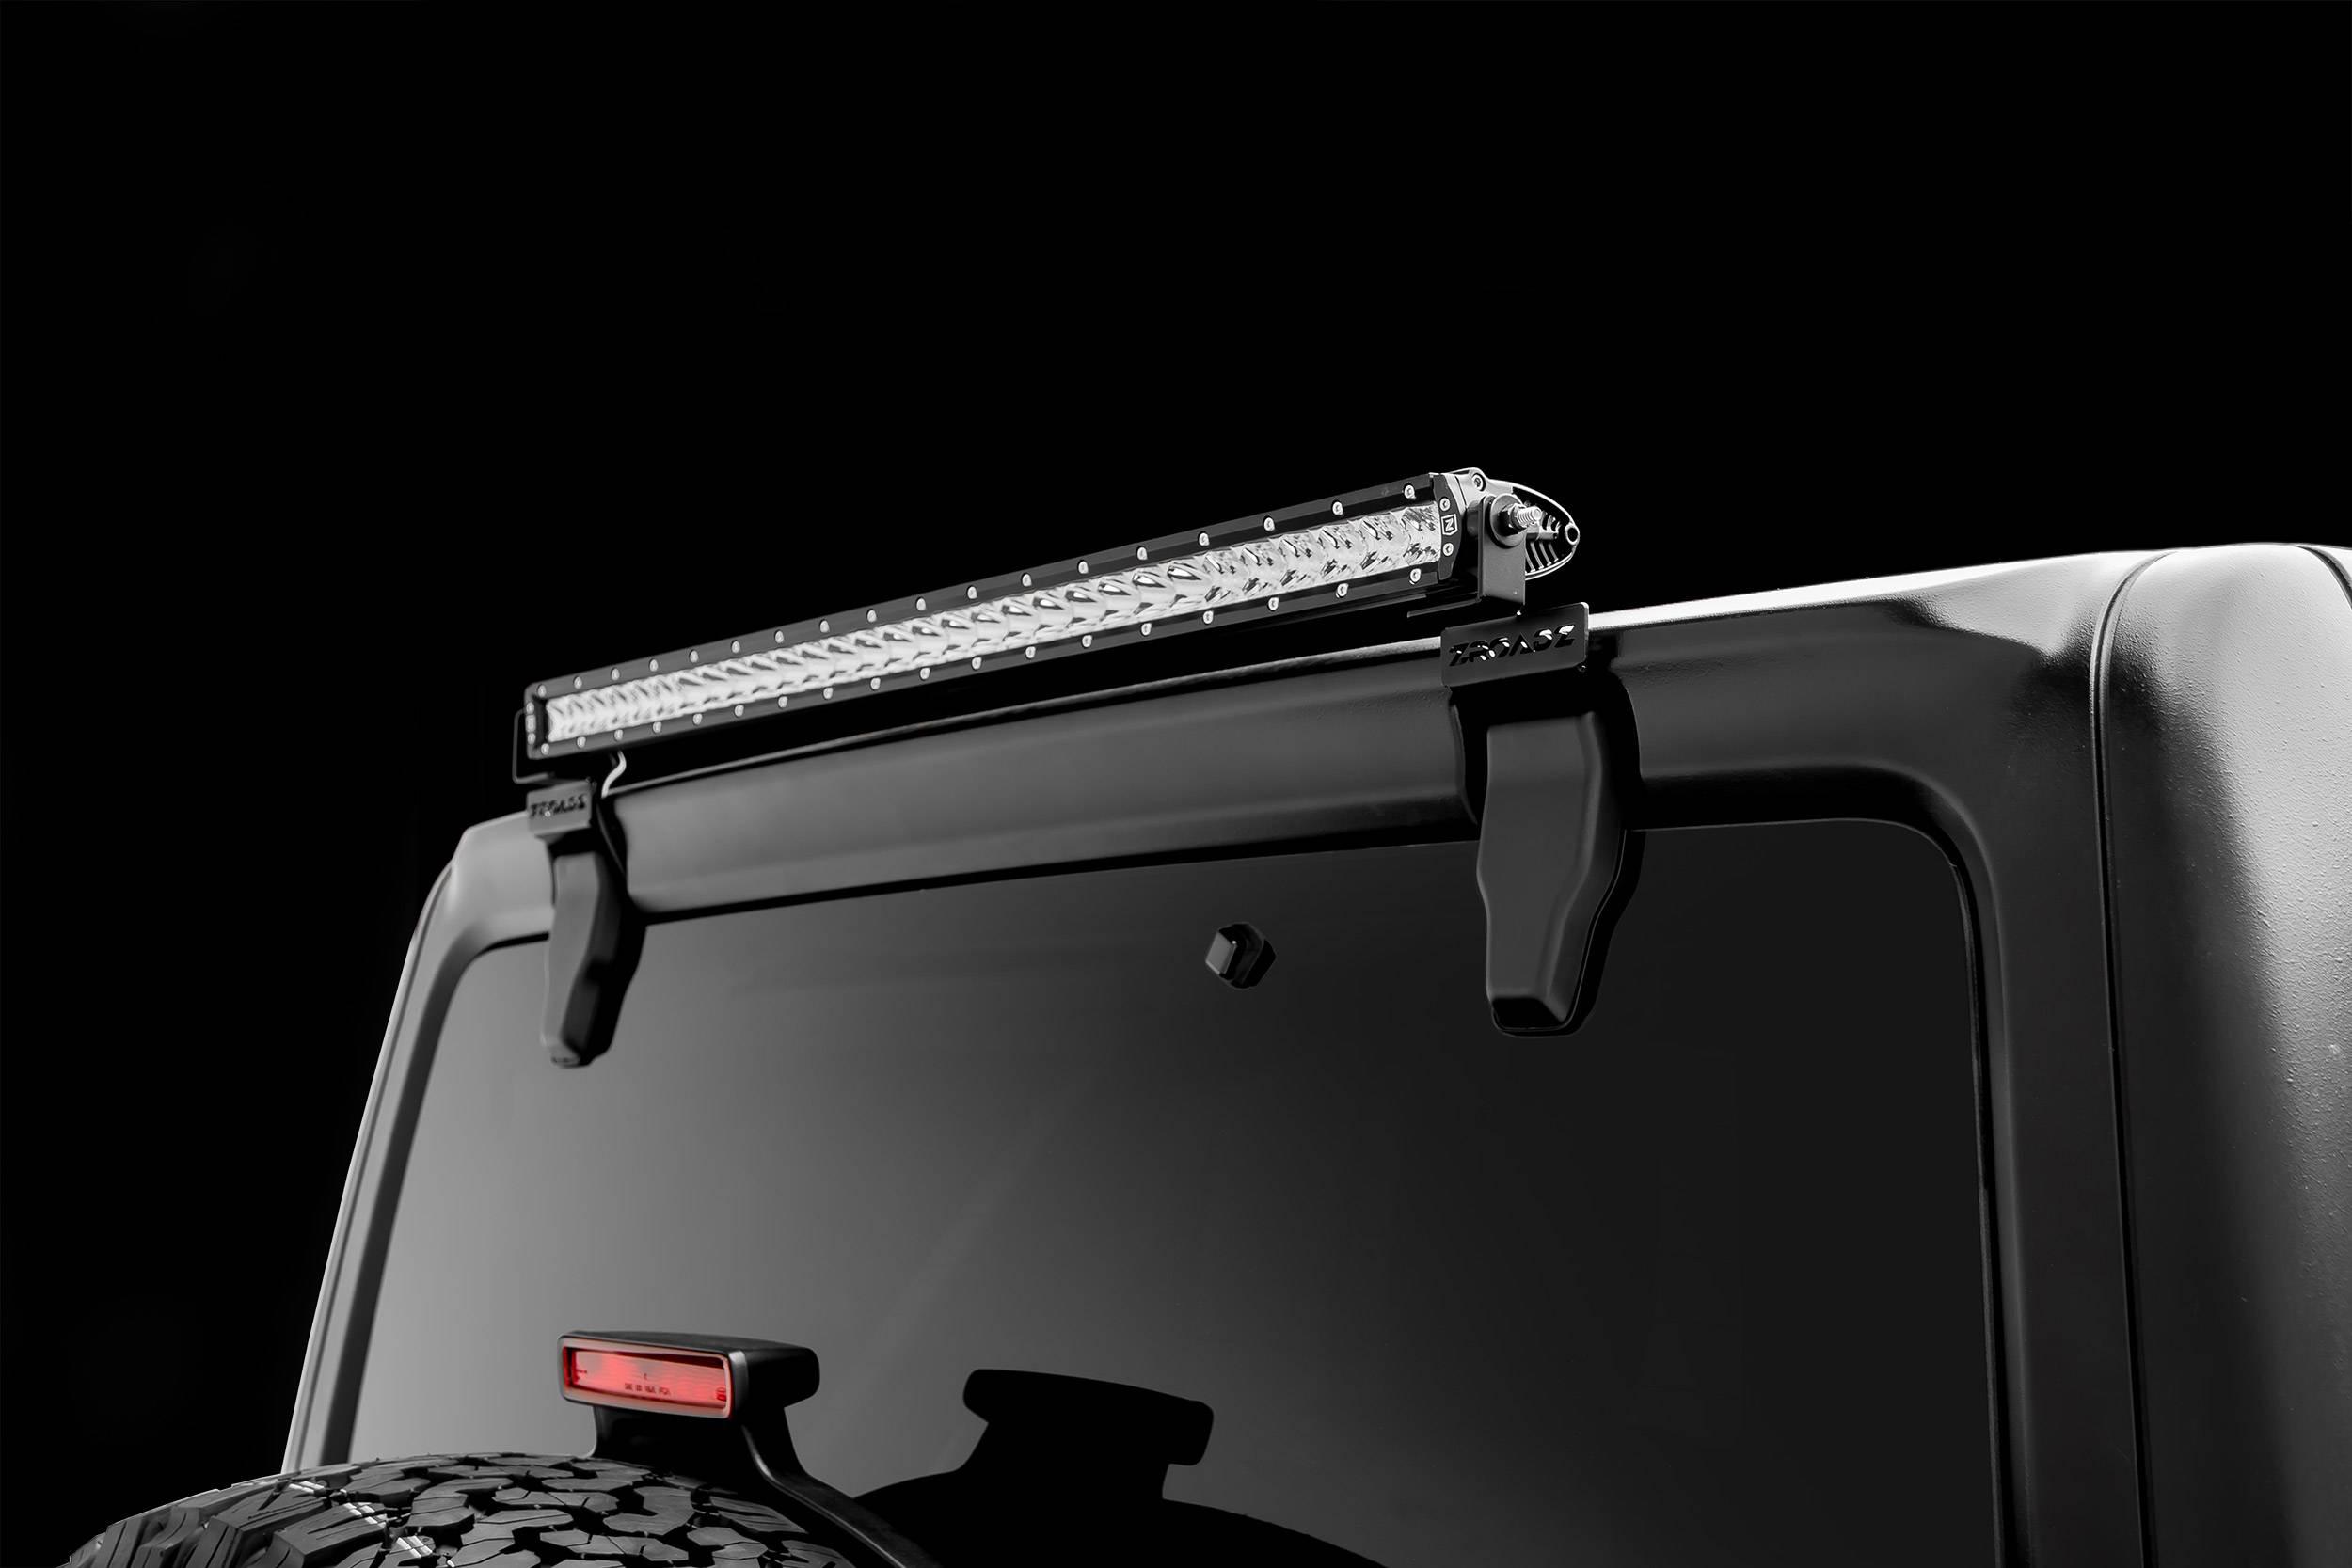 ZROADZ                                             - 2018-2021 Jeep JL Rear Window LED Bracket to mount (1) 30 Inch Staight Single Row LED Light Bar - PN #Z394931